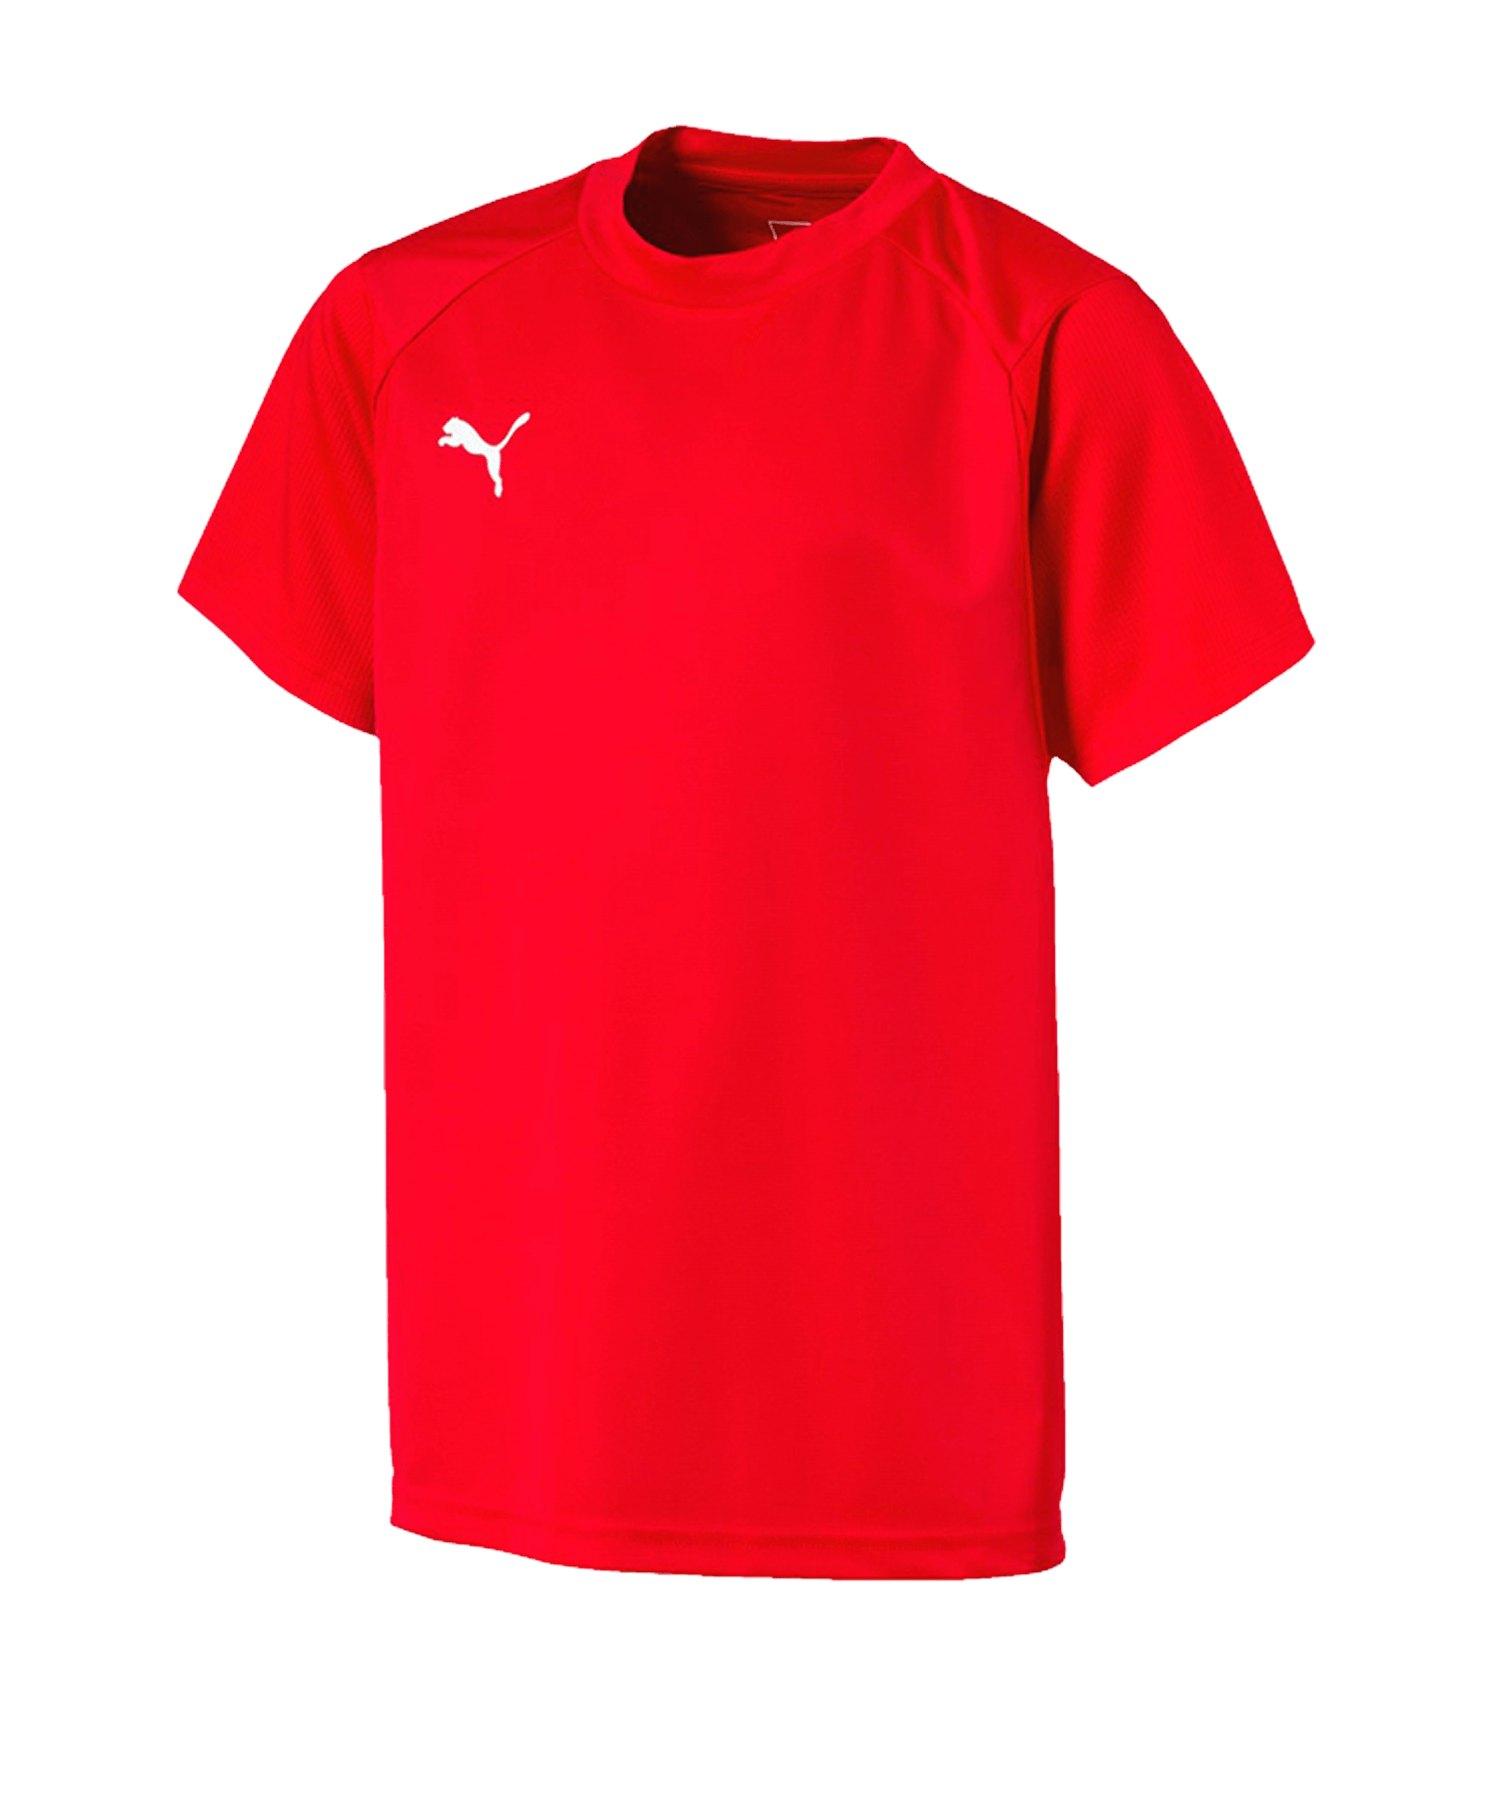 PUMA LIGA Training T-Shirt Kids Rot Weiss F01 - rot